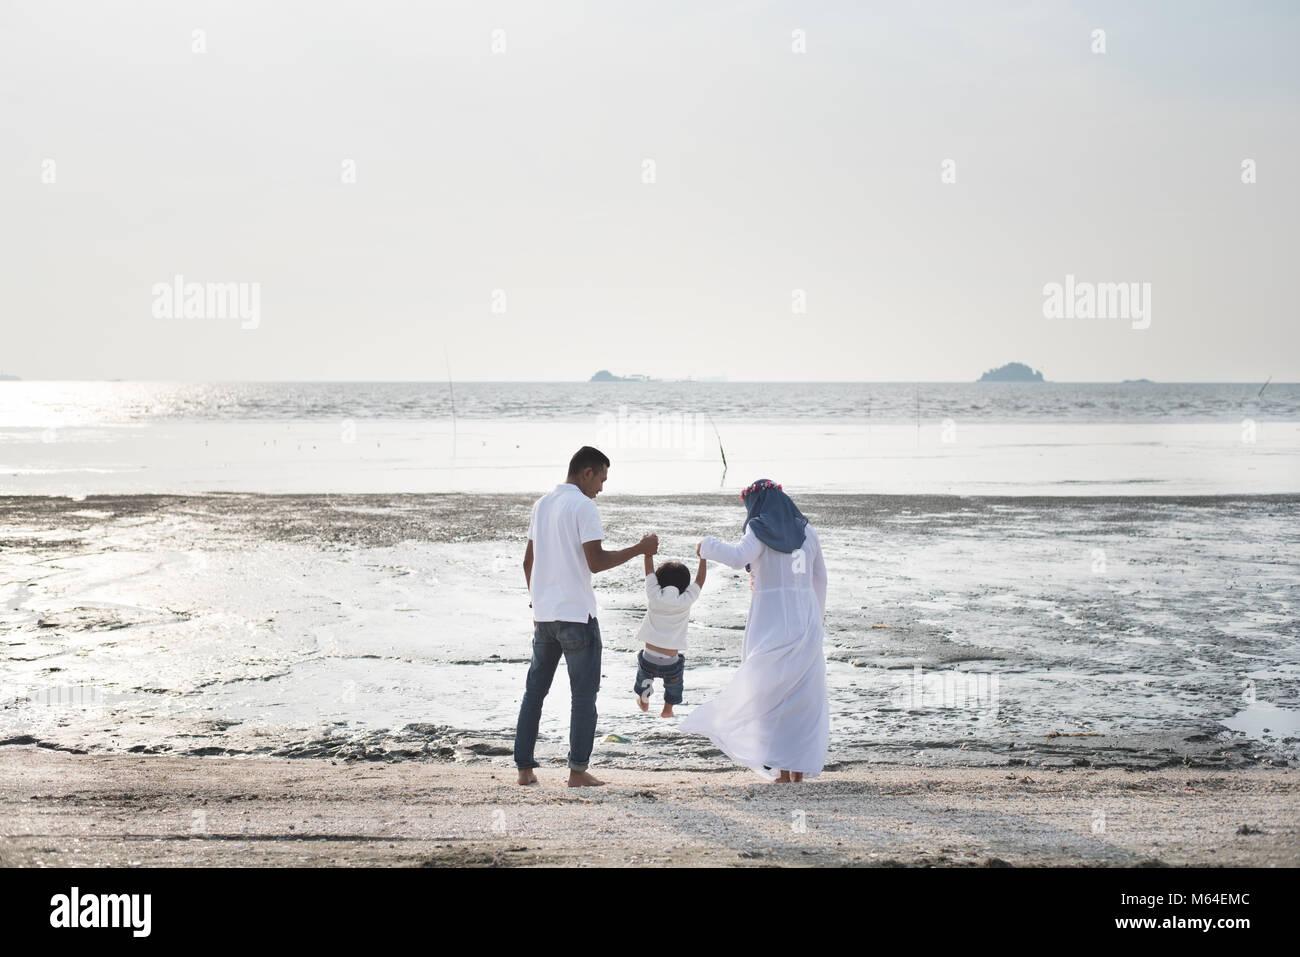 Feliz familia divirtiéndose tiempo juntos en la playa situado en Pantai Remis,Kuala Selangor, Selangor, Malasia. Imagen De Stock